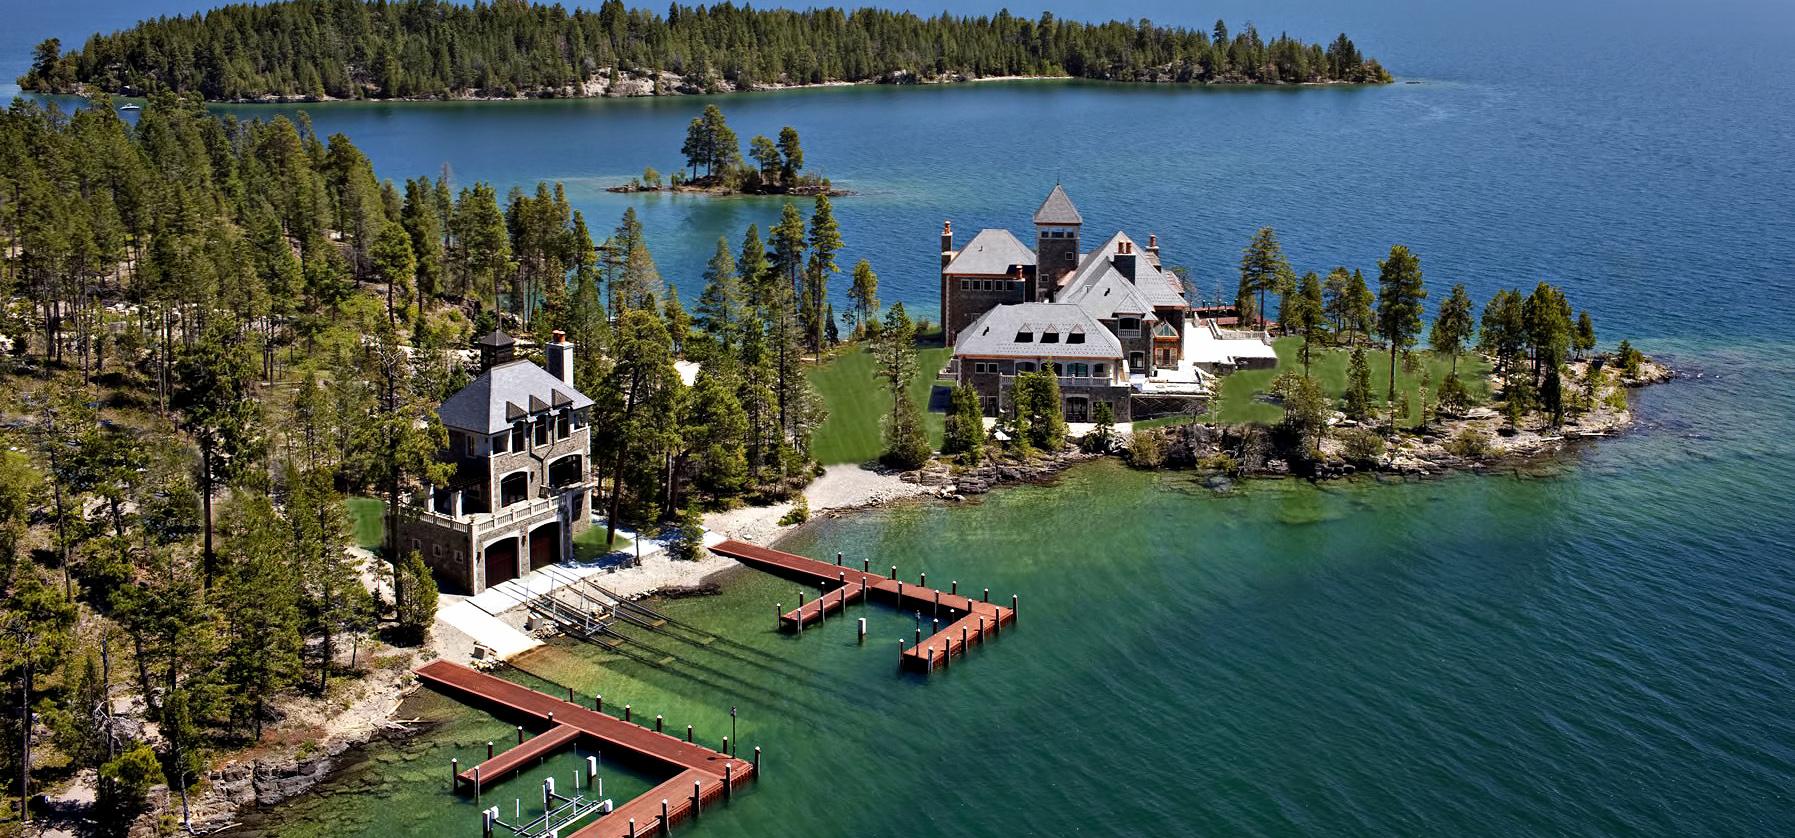 002-Shelter-Island-Estate-Flathead-Lake-Montana